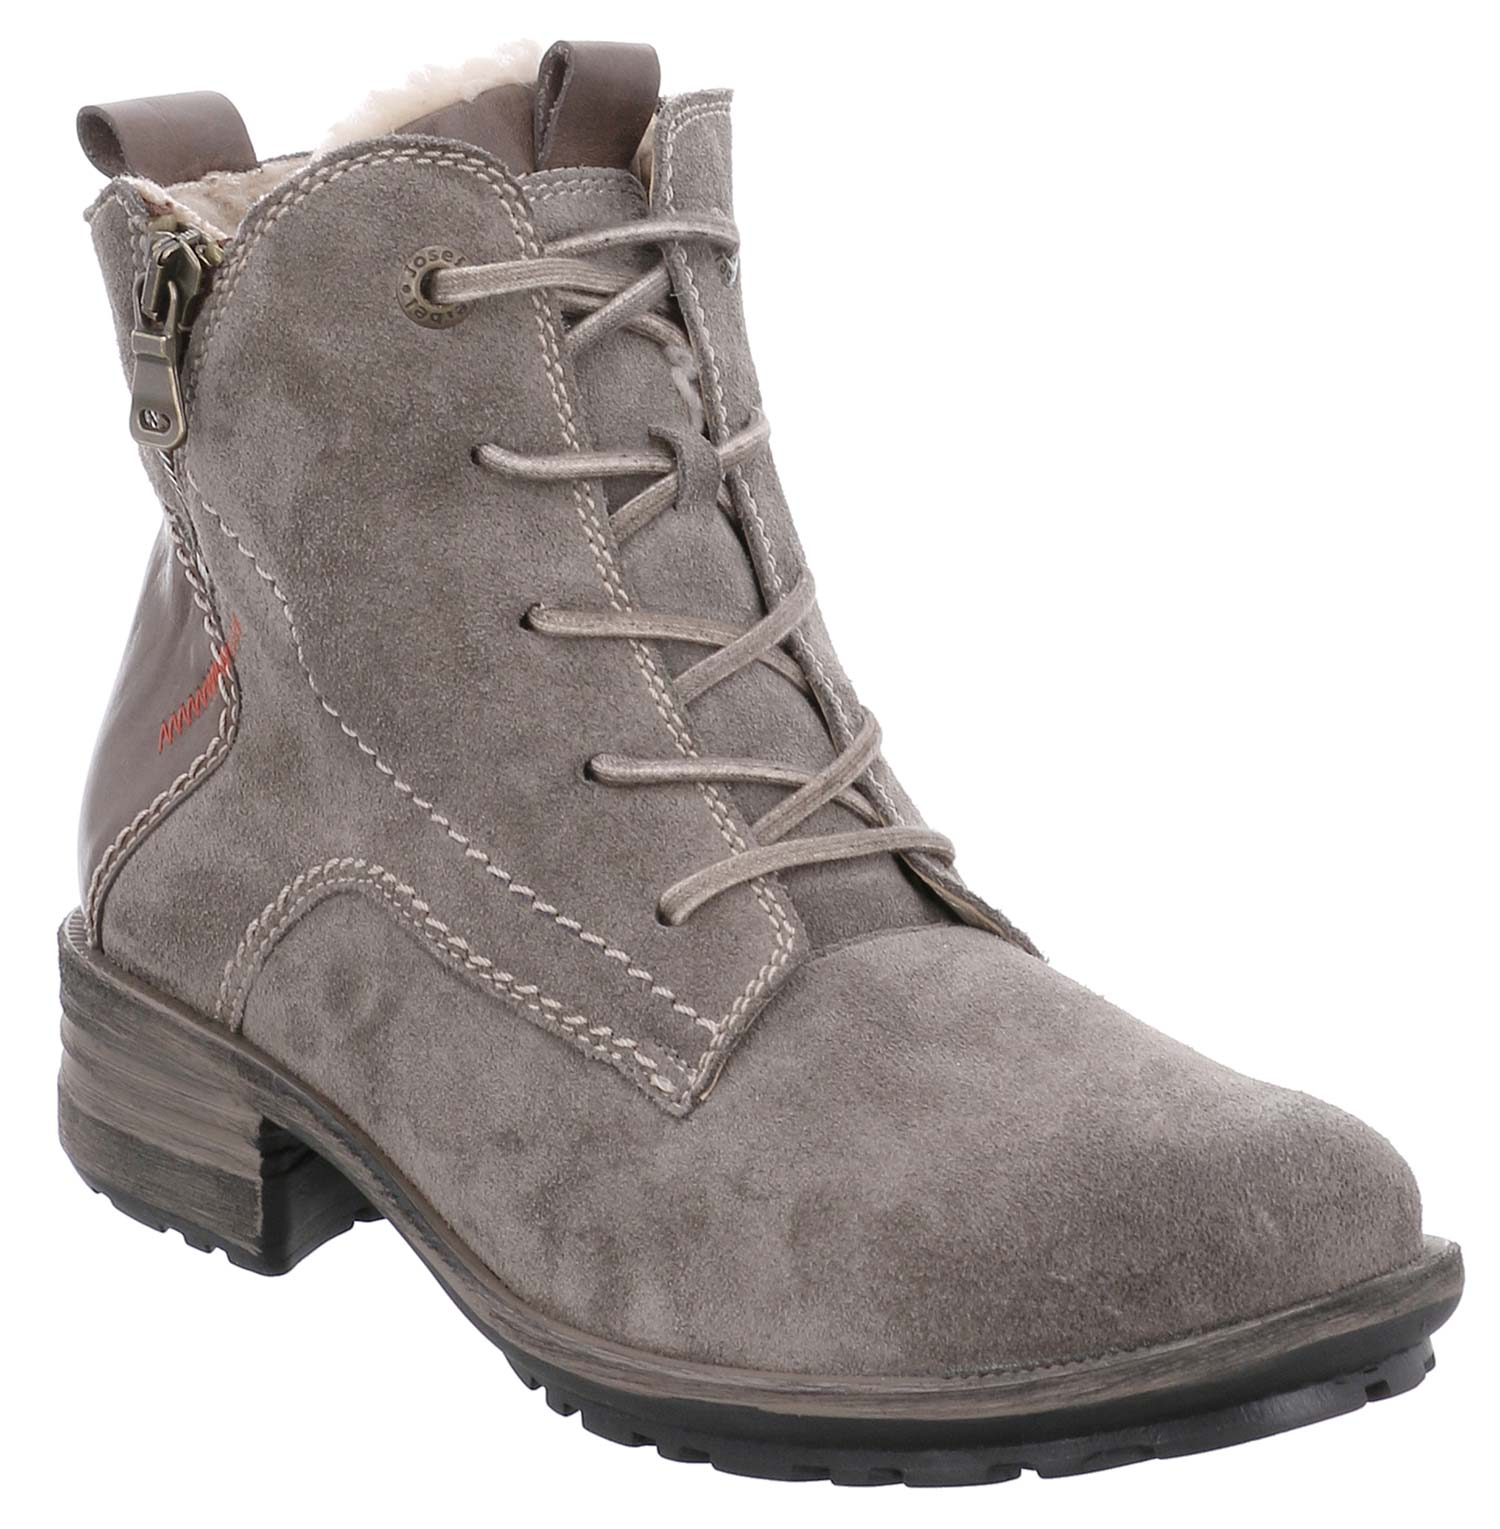 Josef Seibel Sandra Ladies Winter shoes Boots 93897pl949 711 Grey New